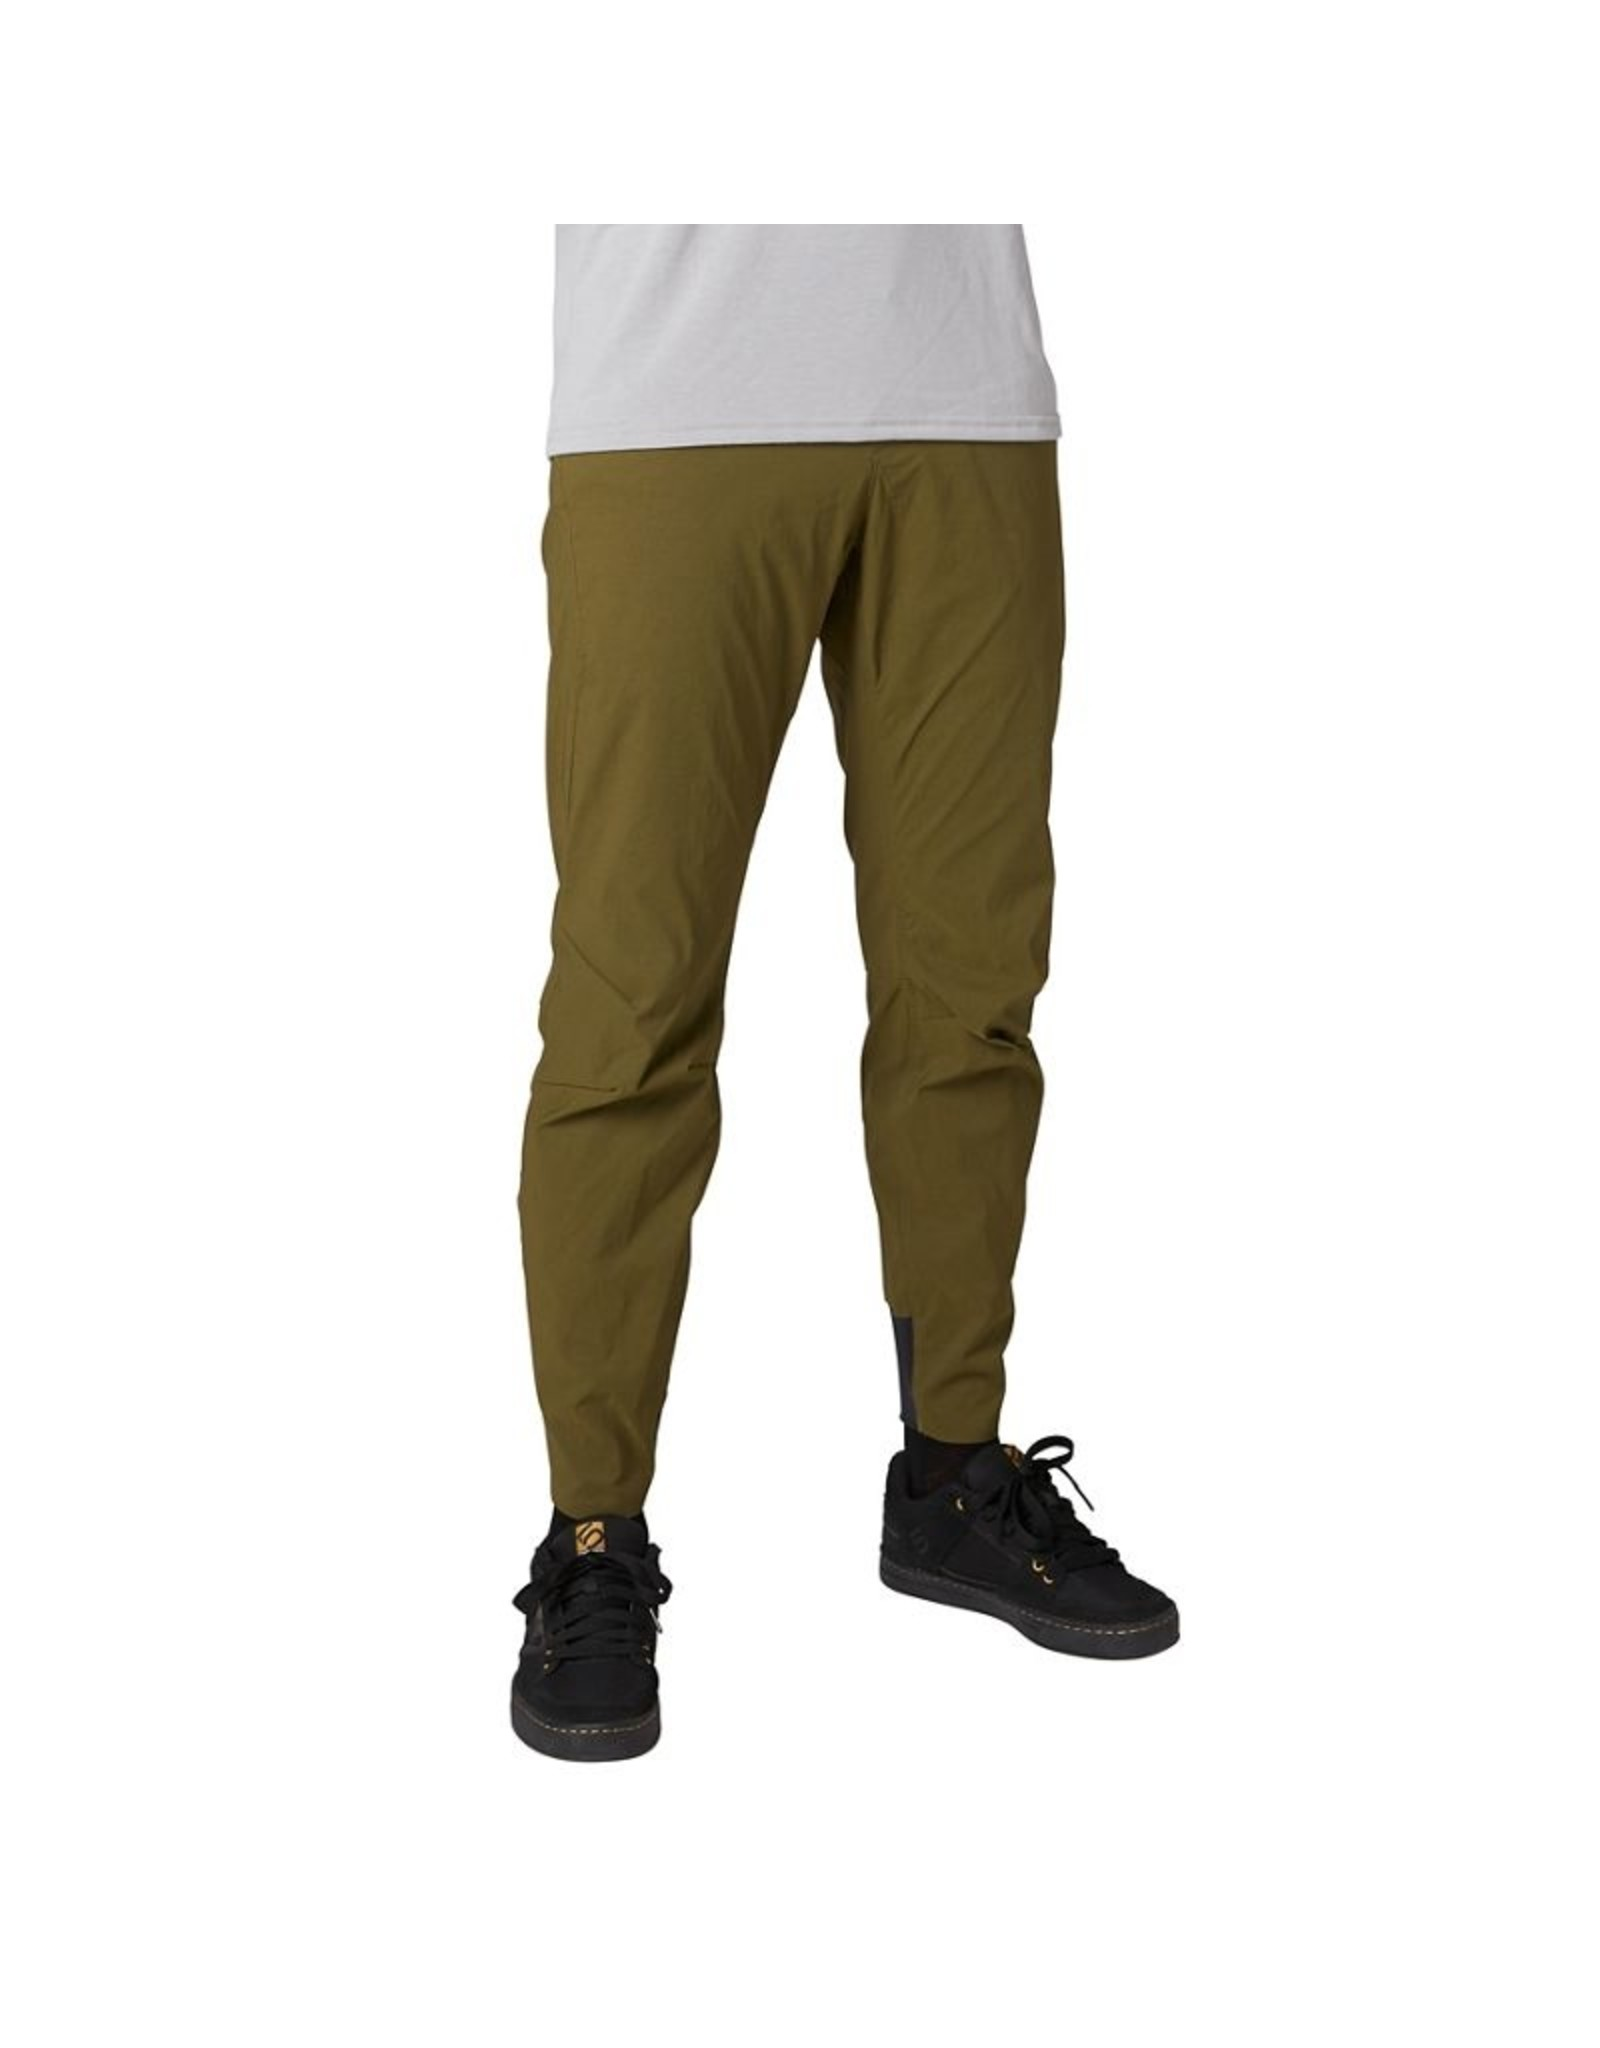 FOX HEAD CLOTHING Mens Ranger Pant Olive Green